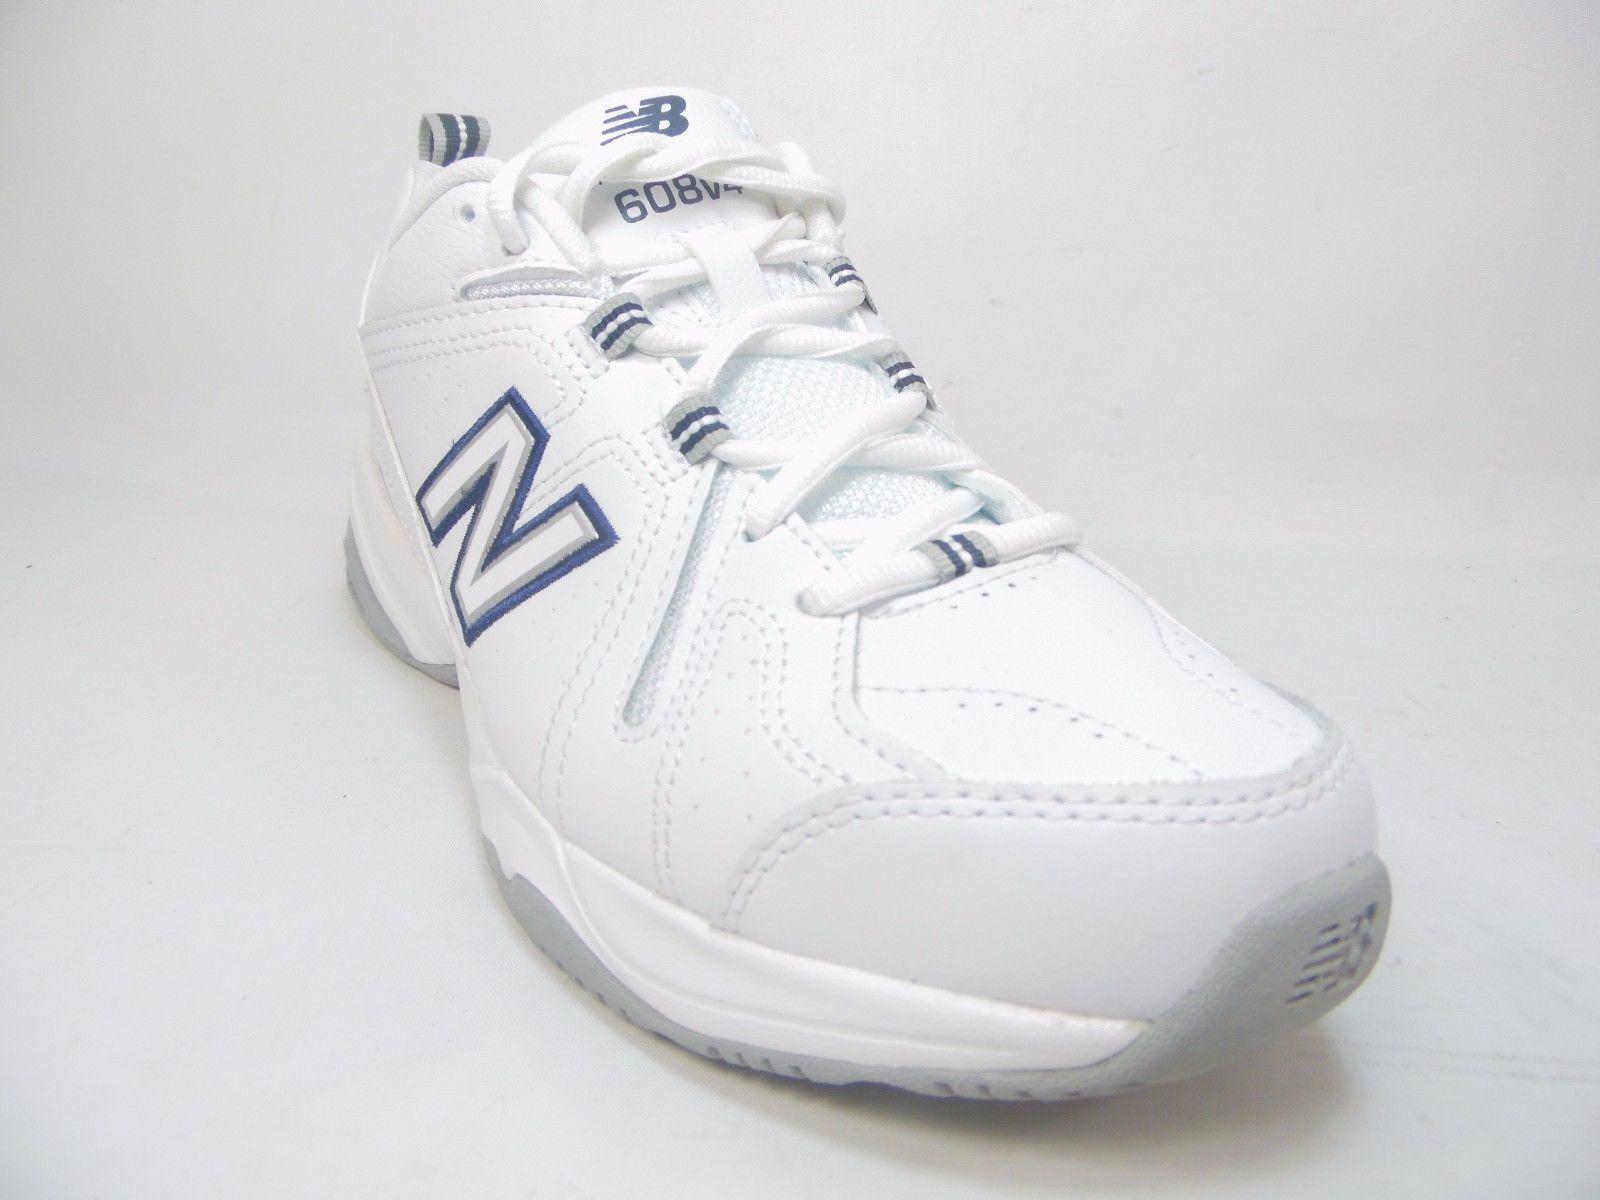 newest 05b44 e4c1b New Balance 608V4 Womens Training Shoes White Gray Size 9.5B